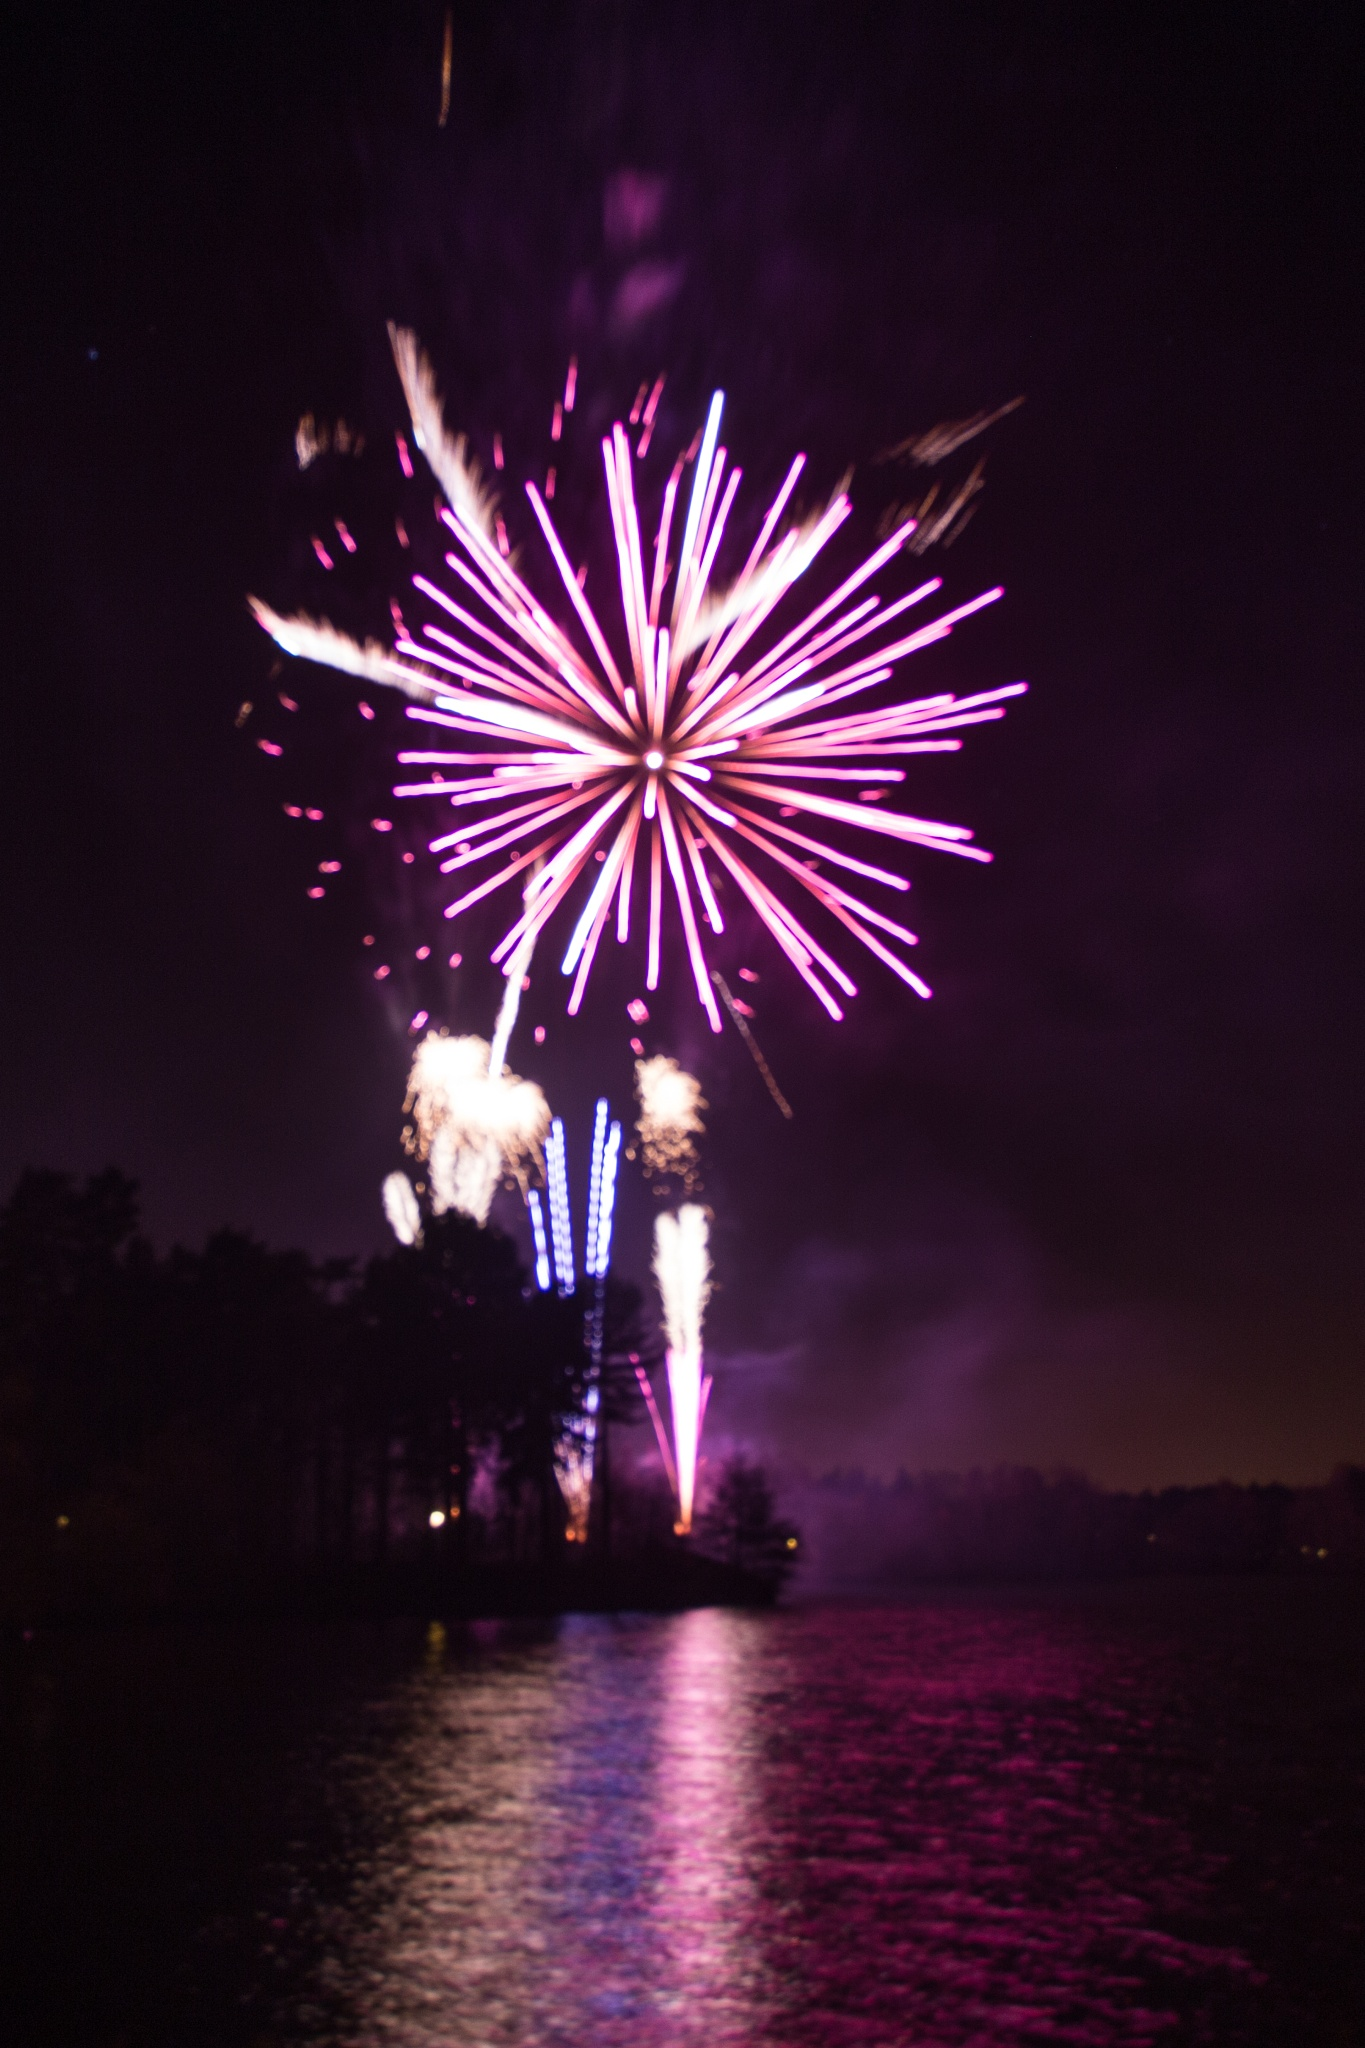 Fireworks by Russ Burton